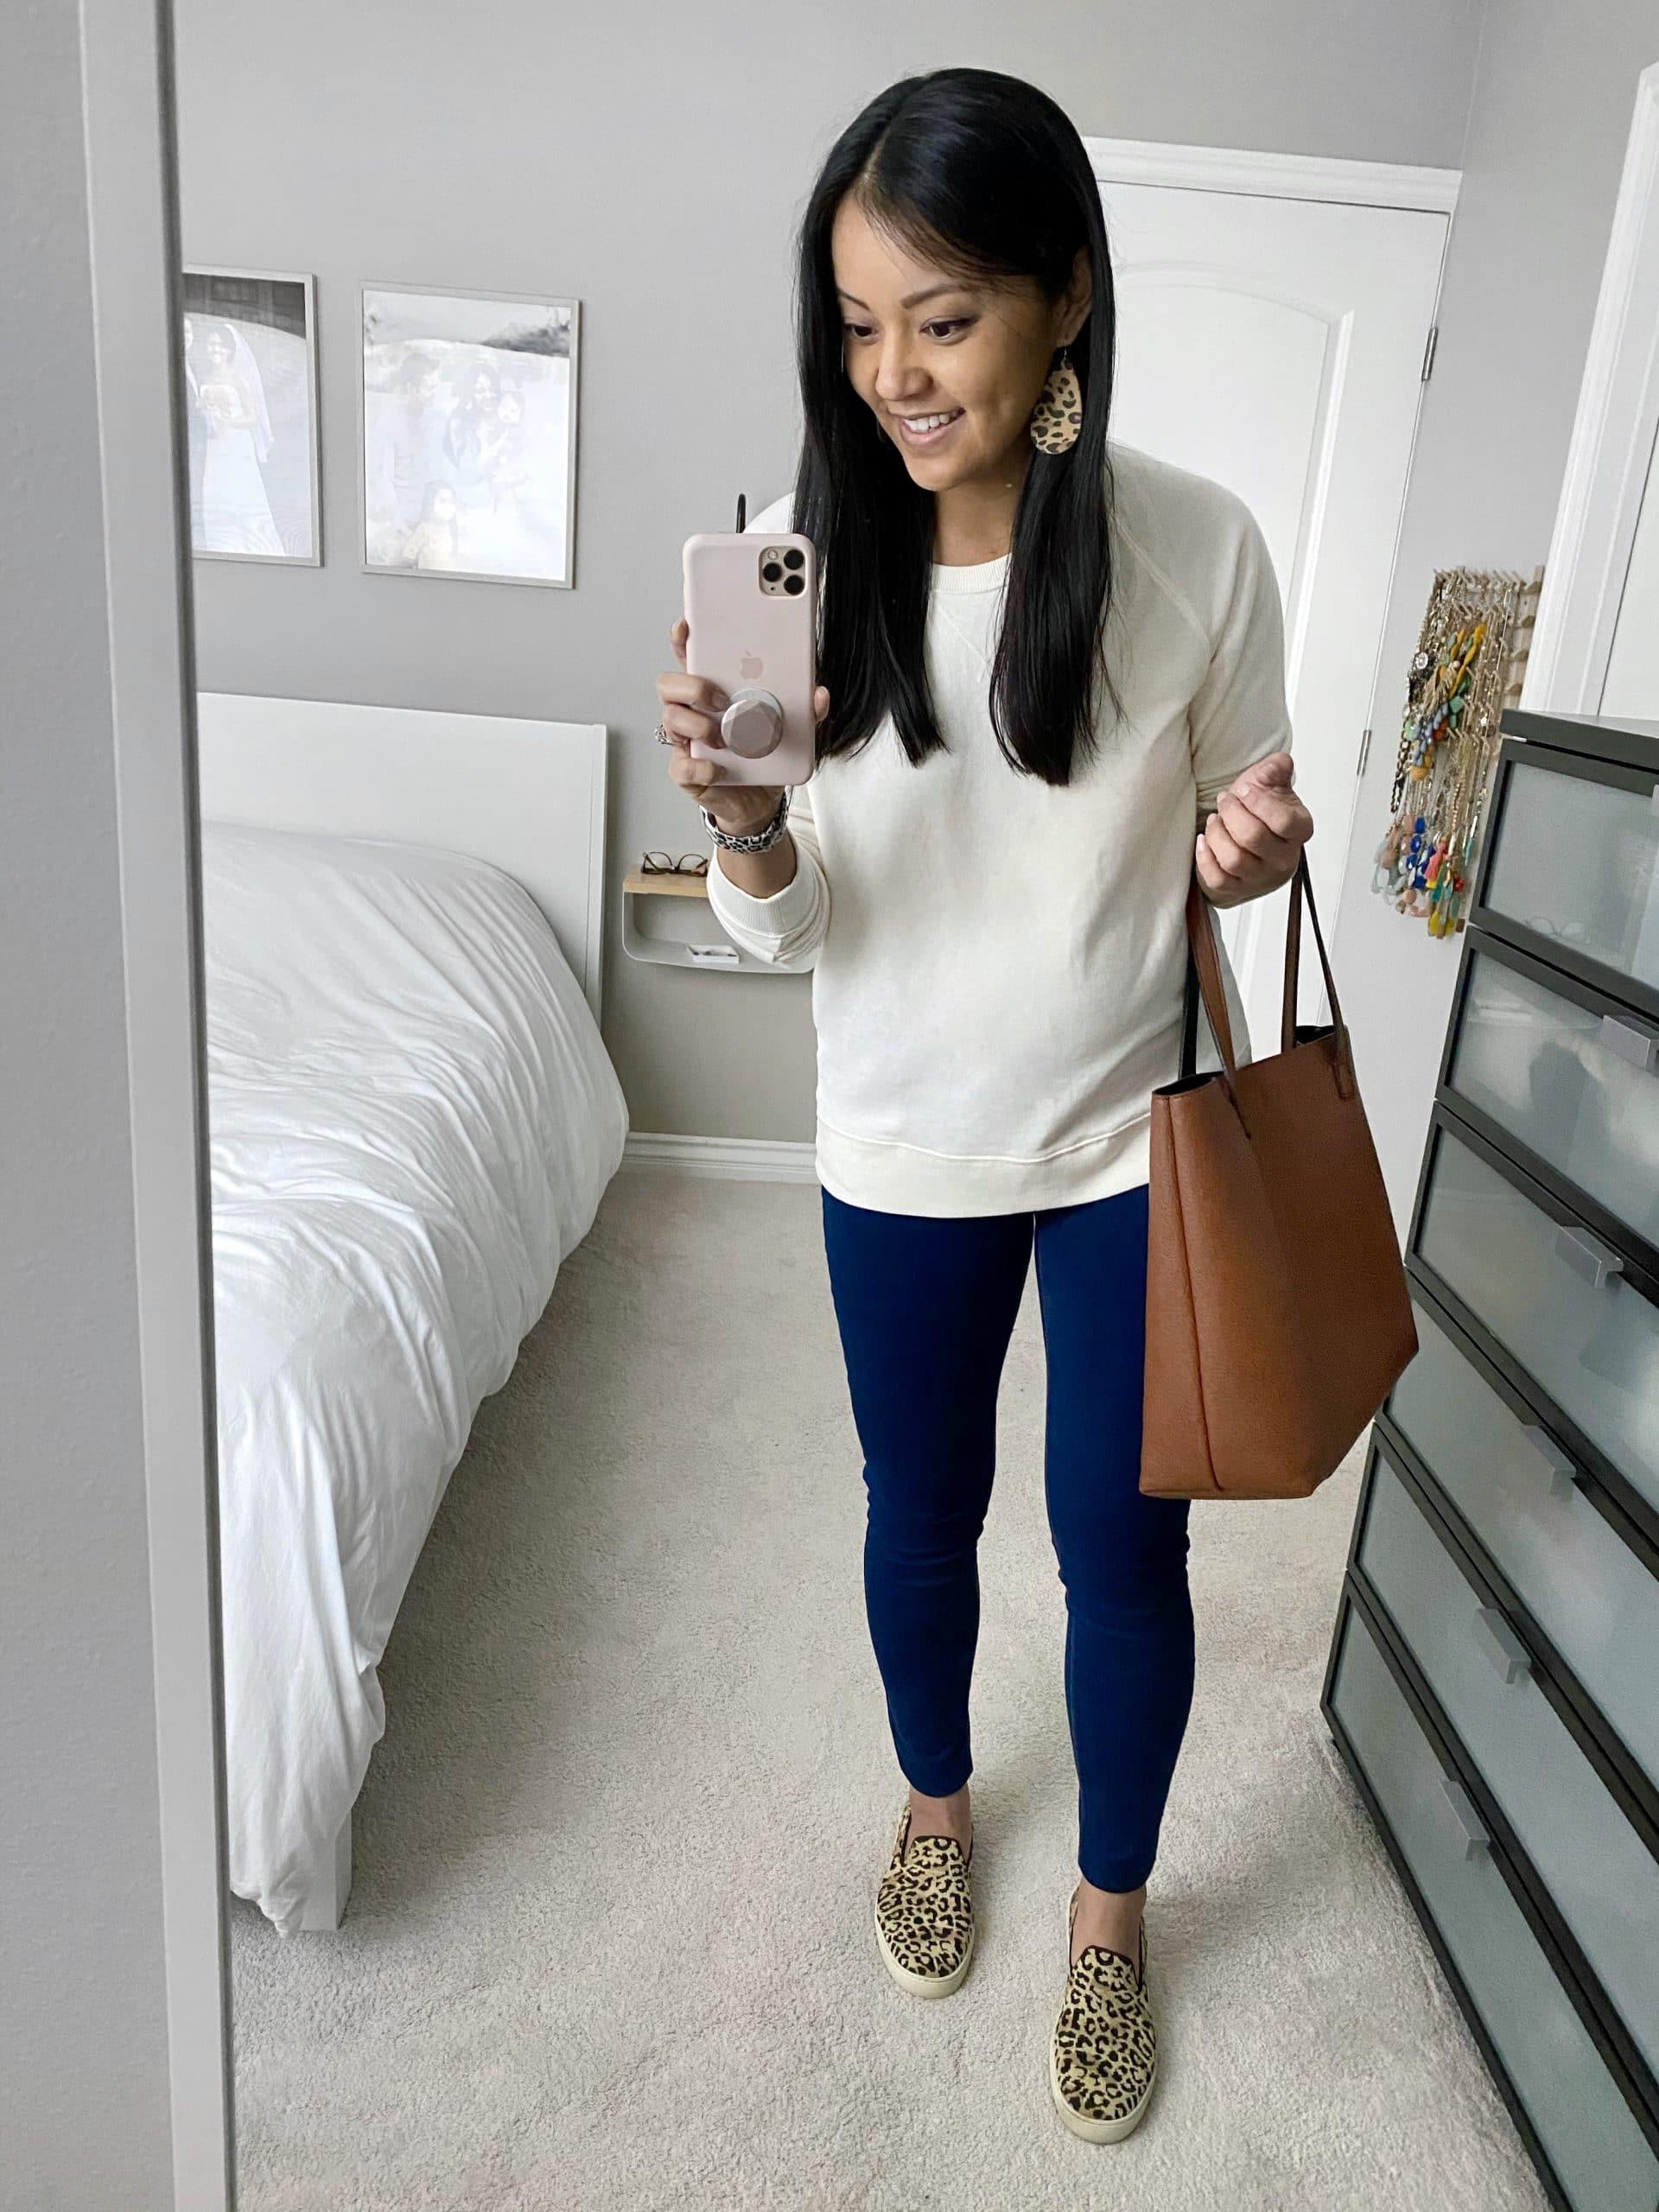 Casual Spring Outfit: cream pullover sweatshirt + dark skinny jeans + leopard slip-on sneakers + cognac tote bag + leopard leather earrings